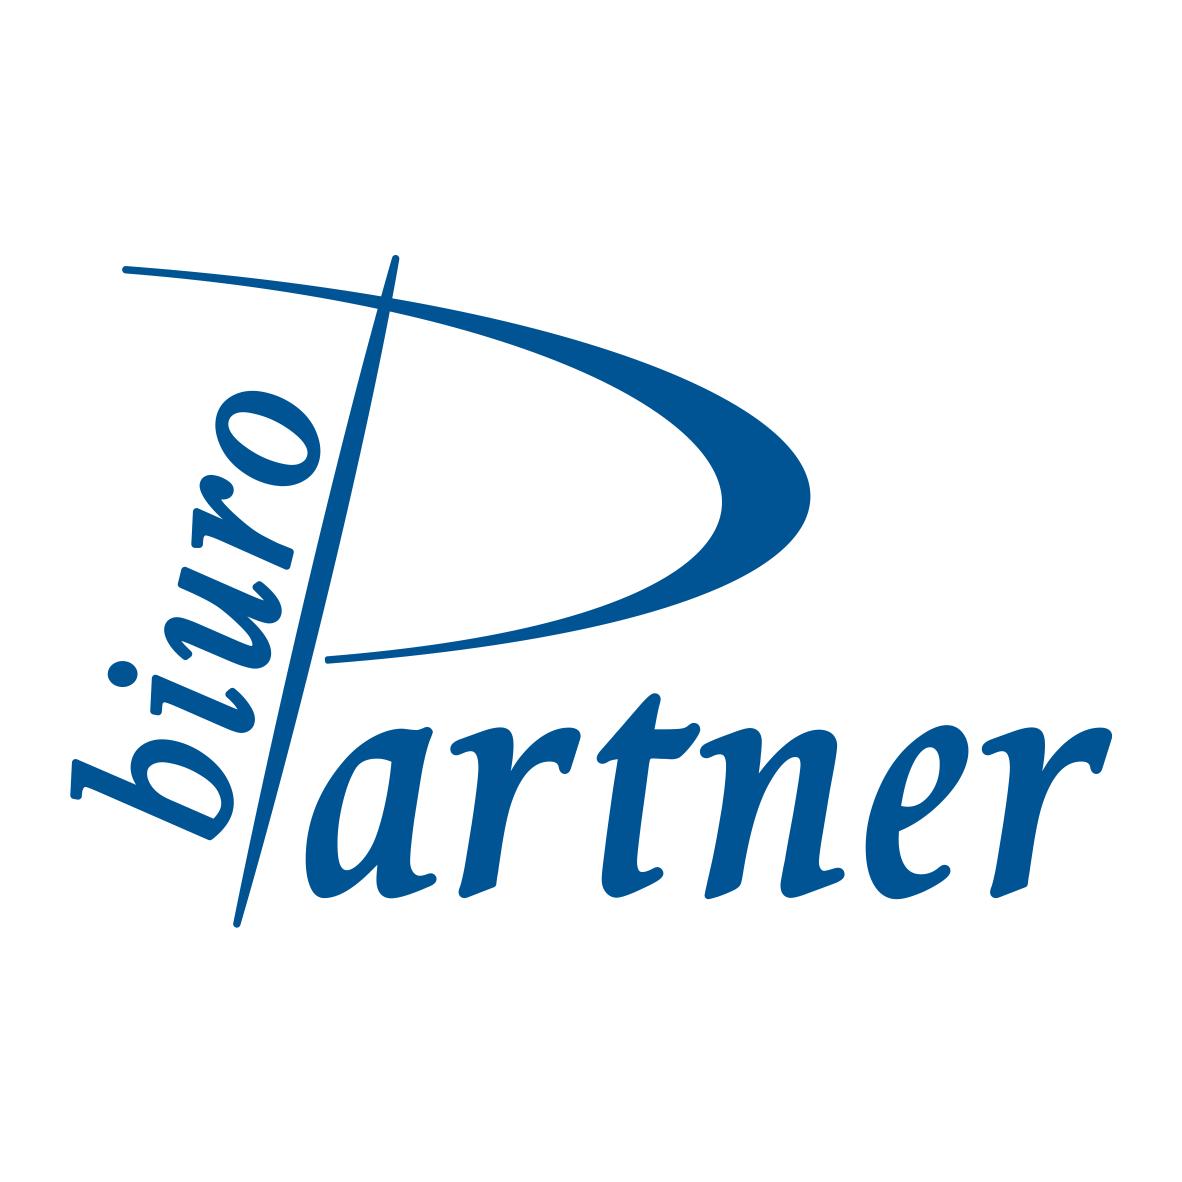 Biuro Partner – artykuły biurowe Leszno